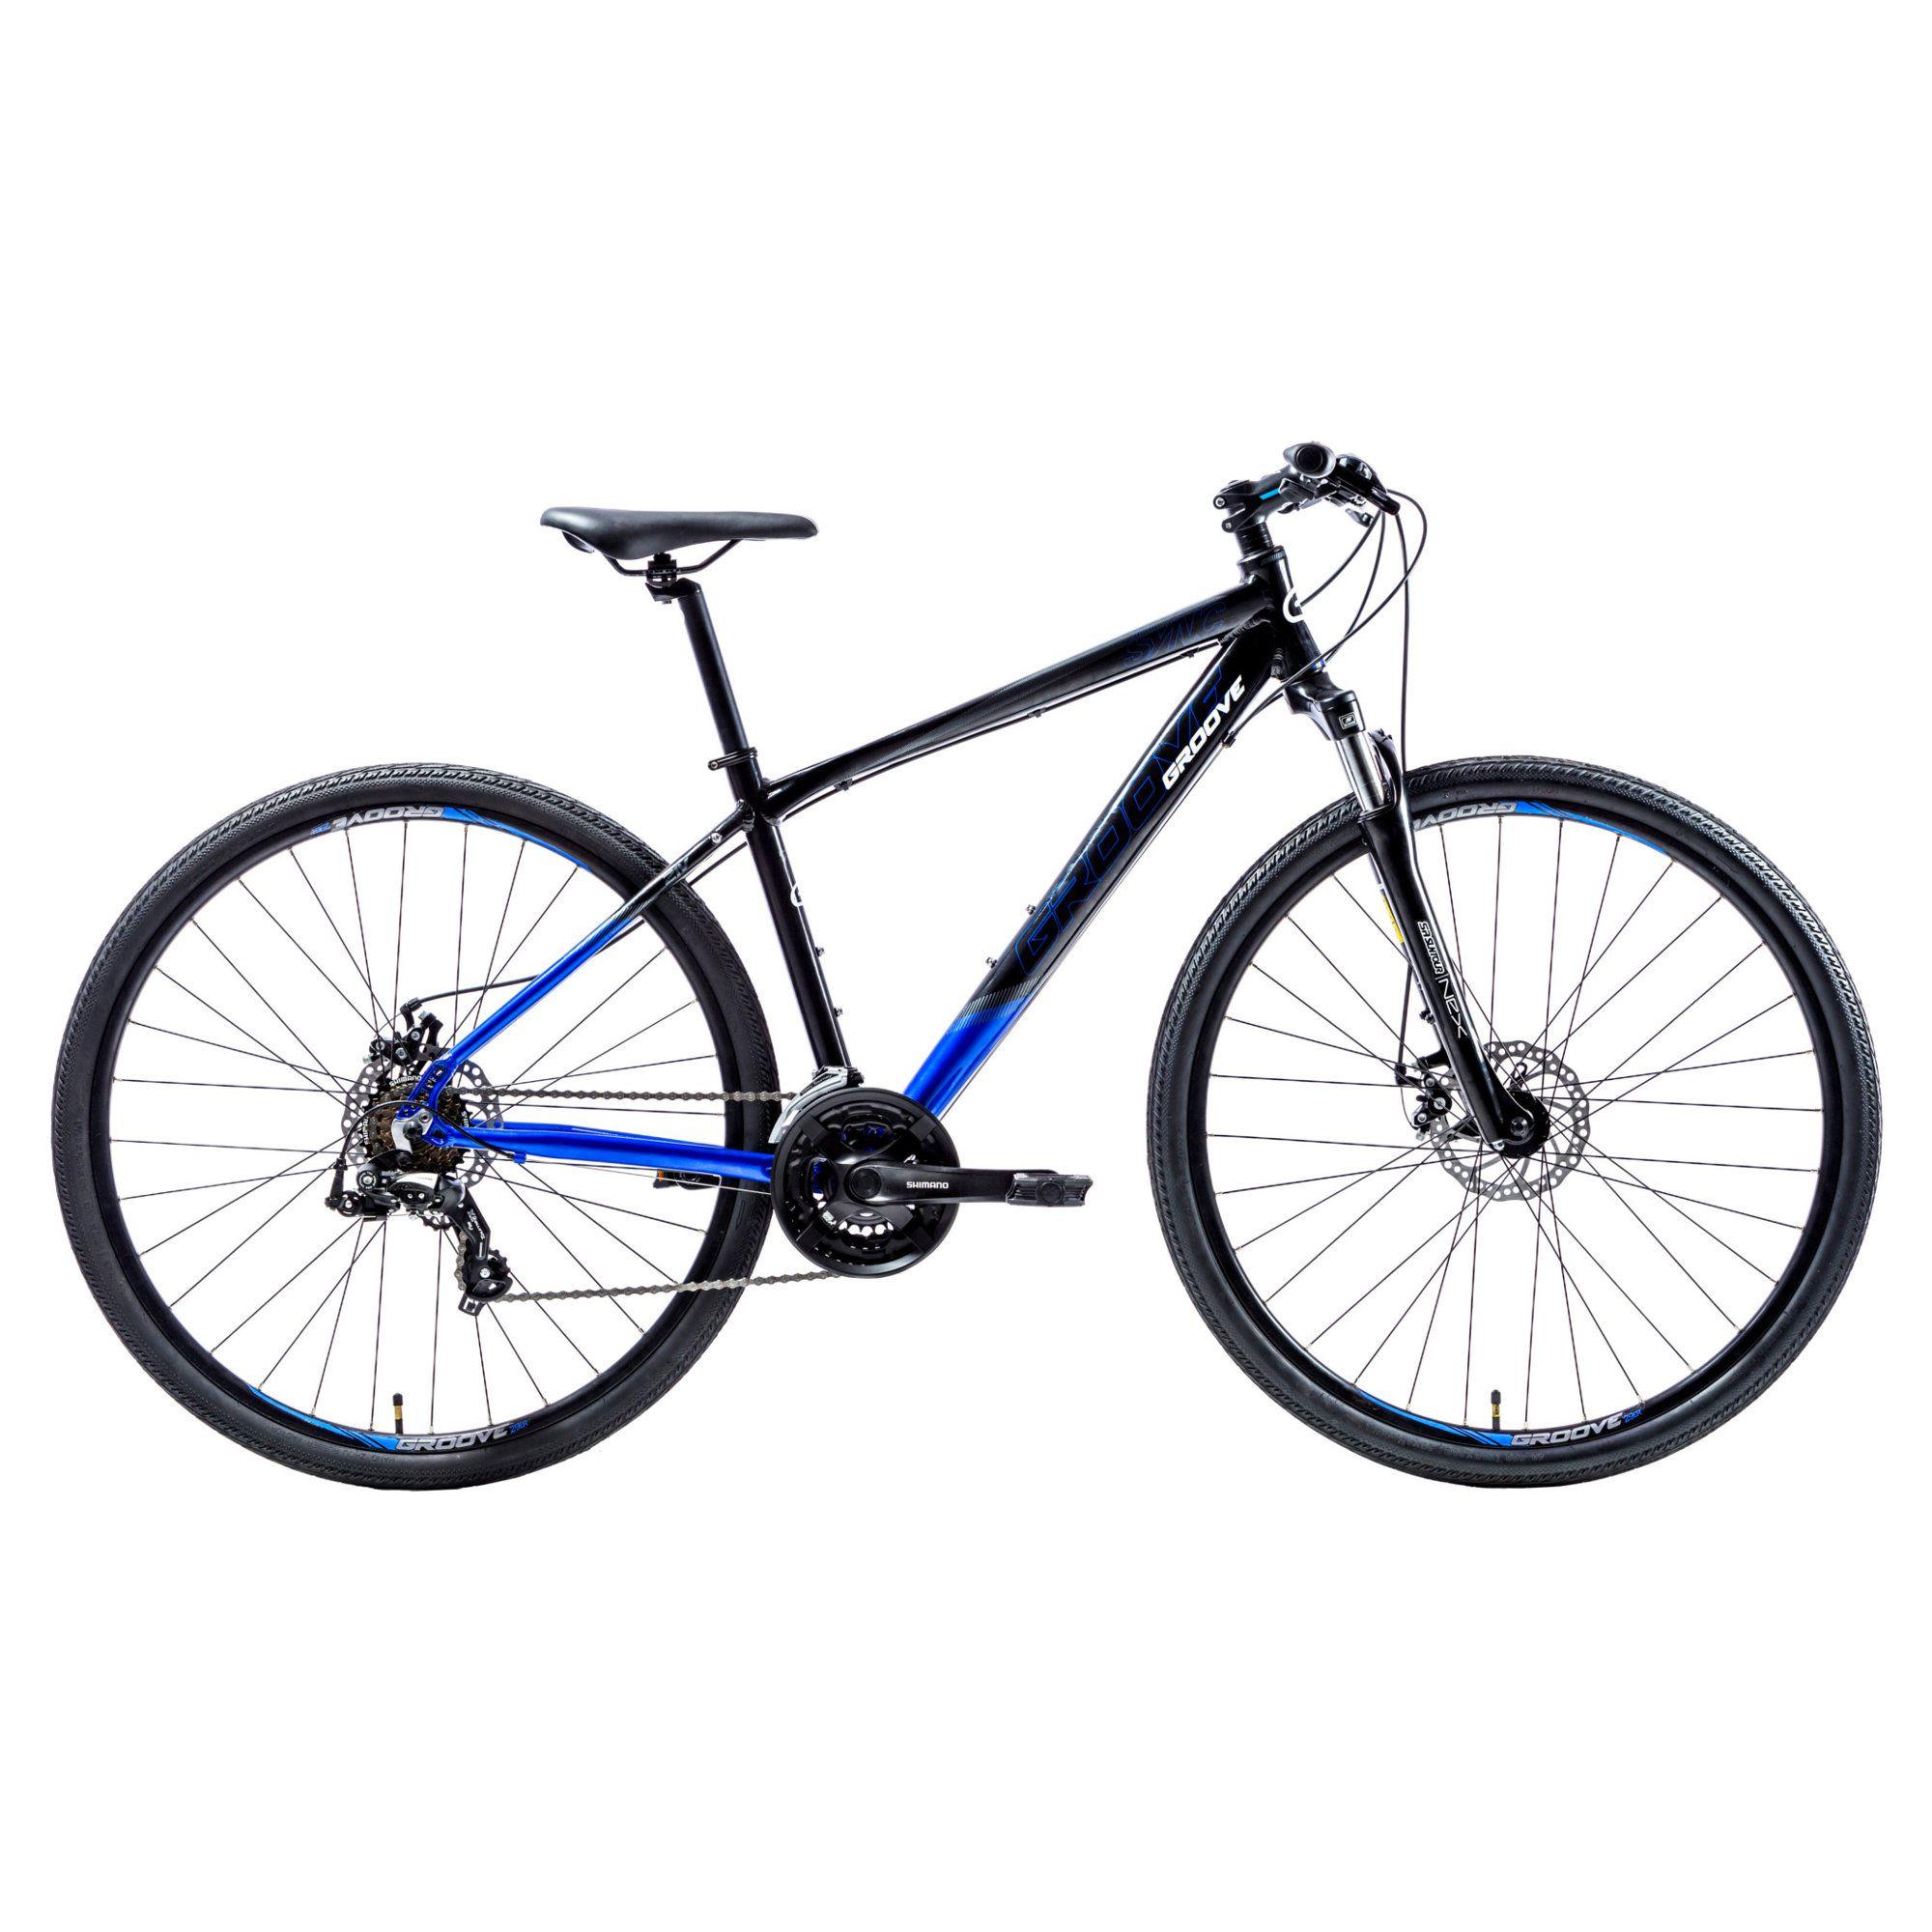 Bicicleta Urbana Groove Sync Trail 21v 2017